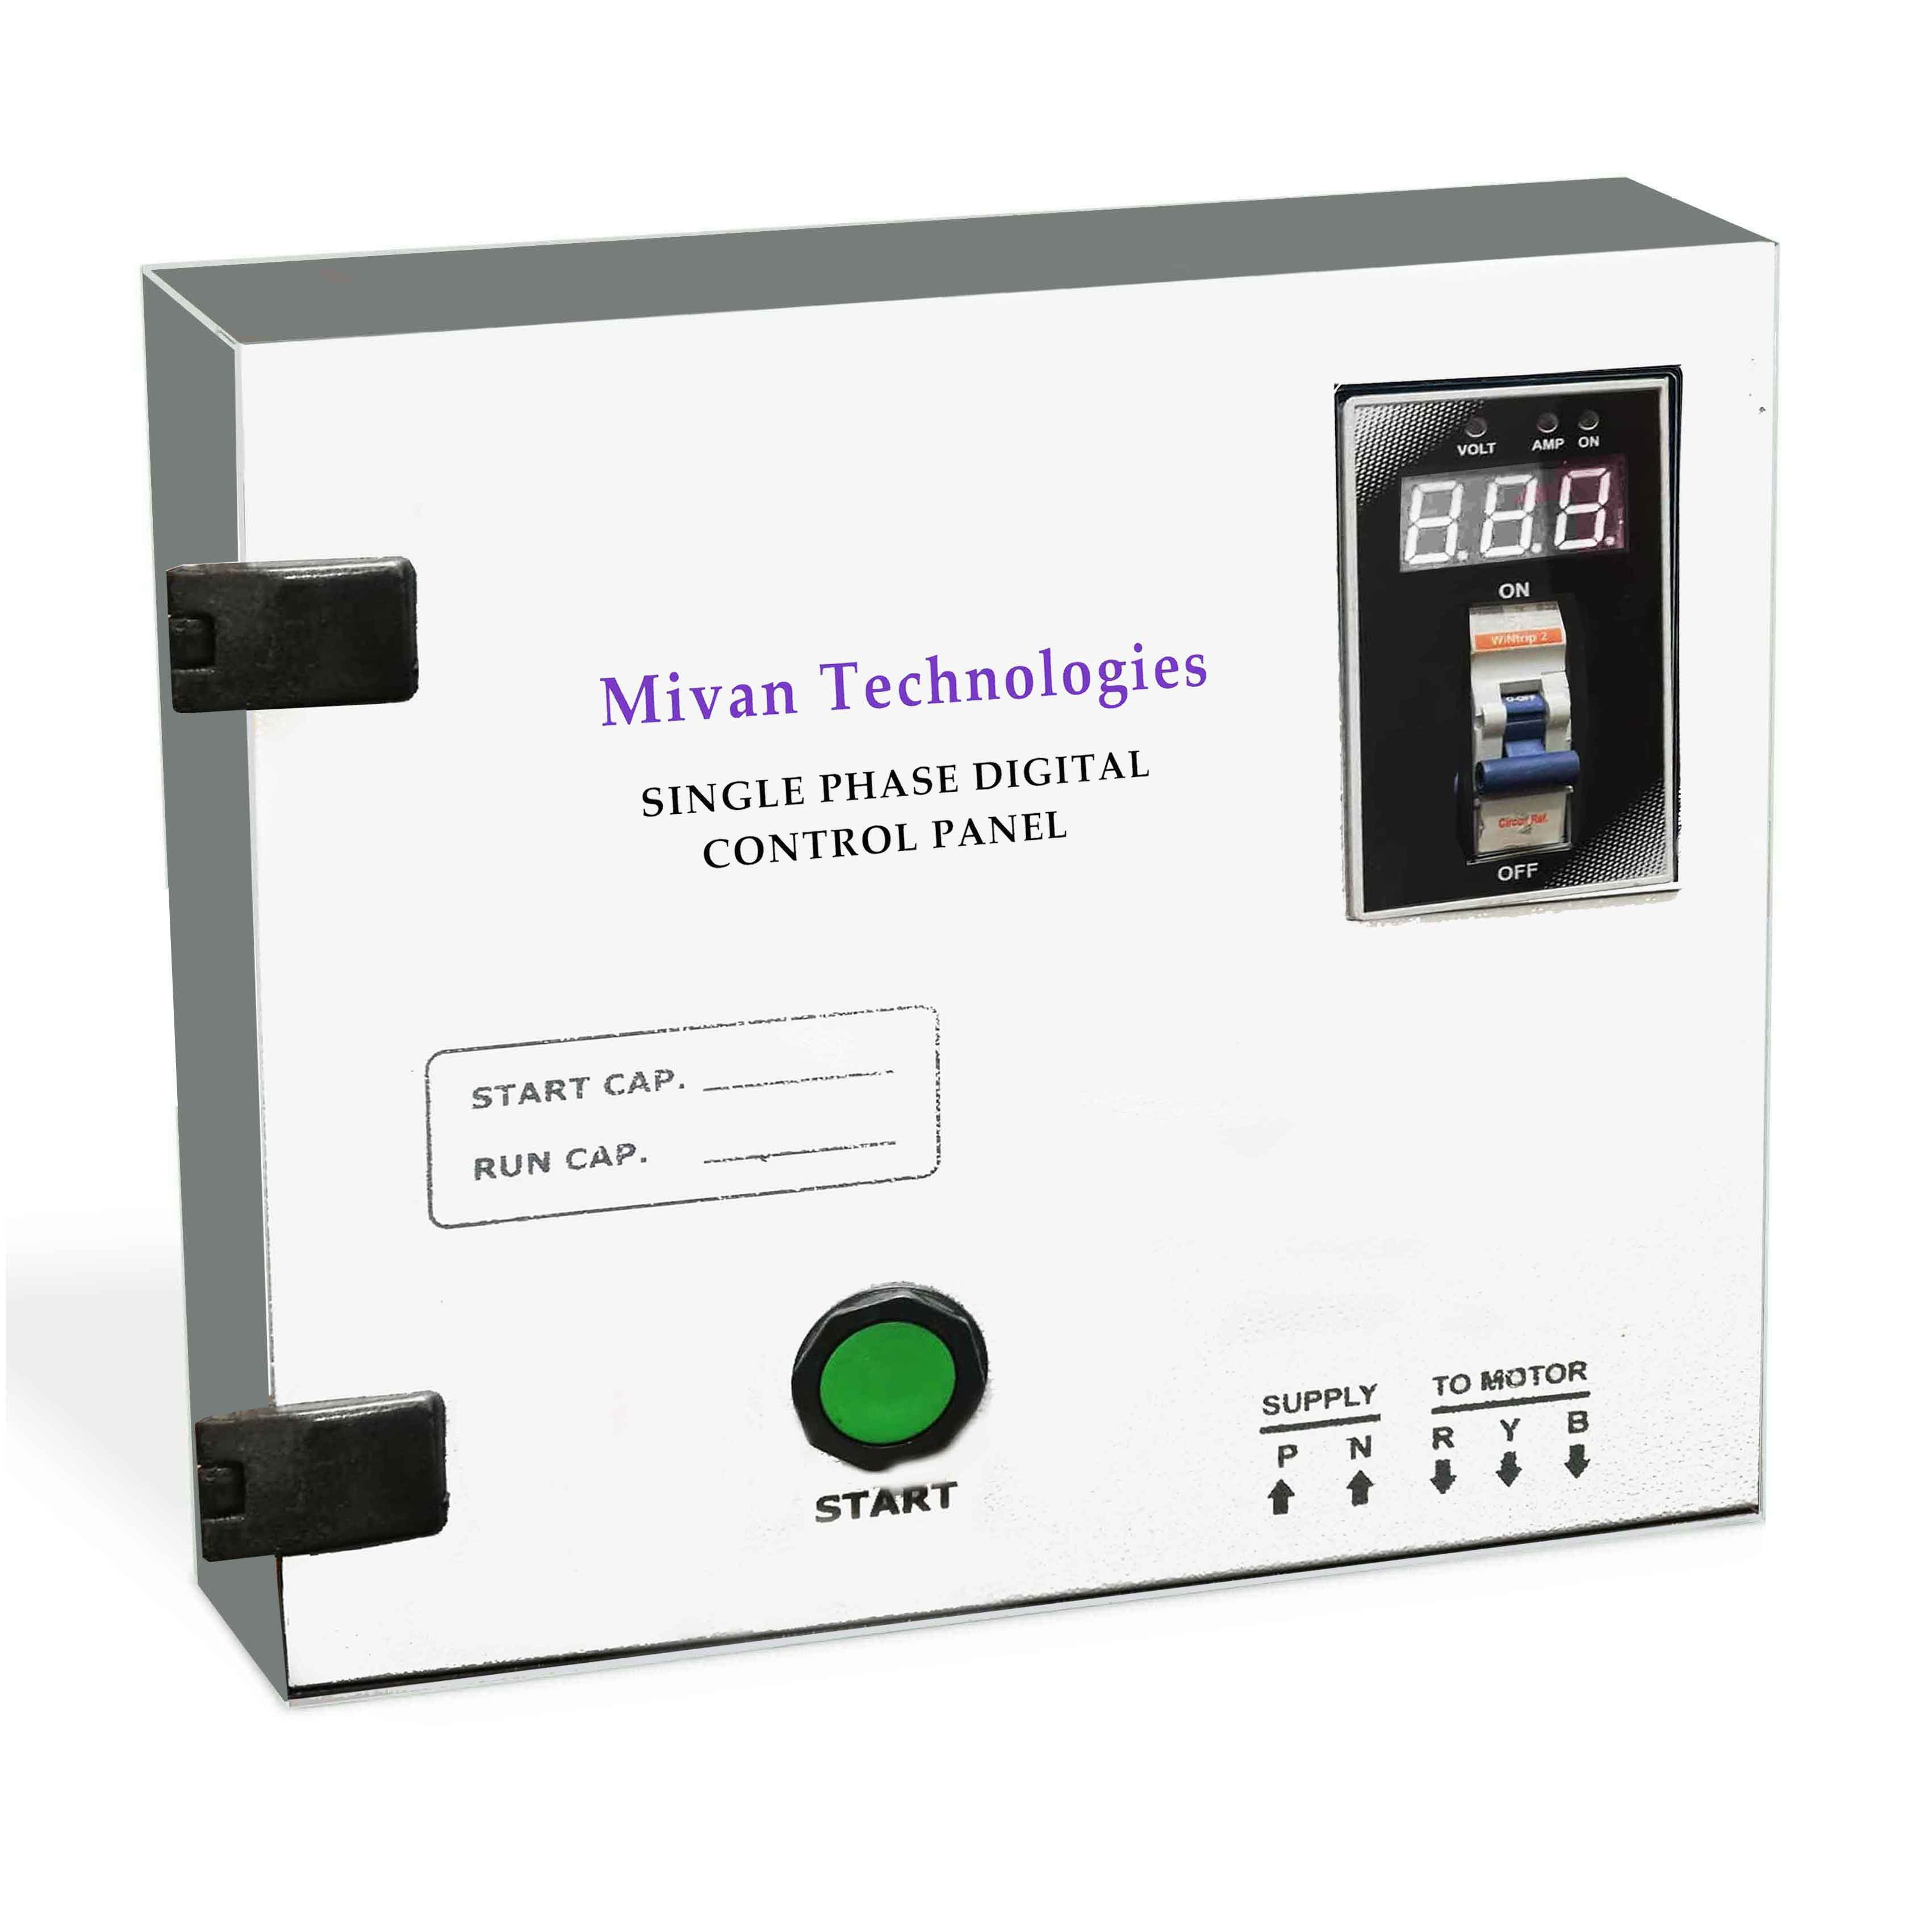 https://mivan.co.in/assets/img/product/15737317840_286_131333.jpg